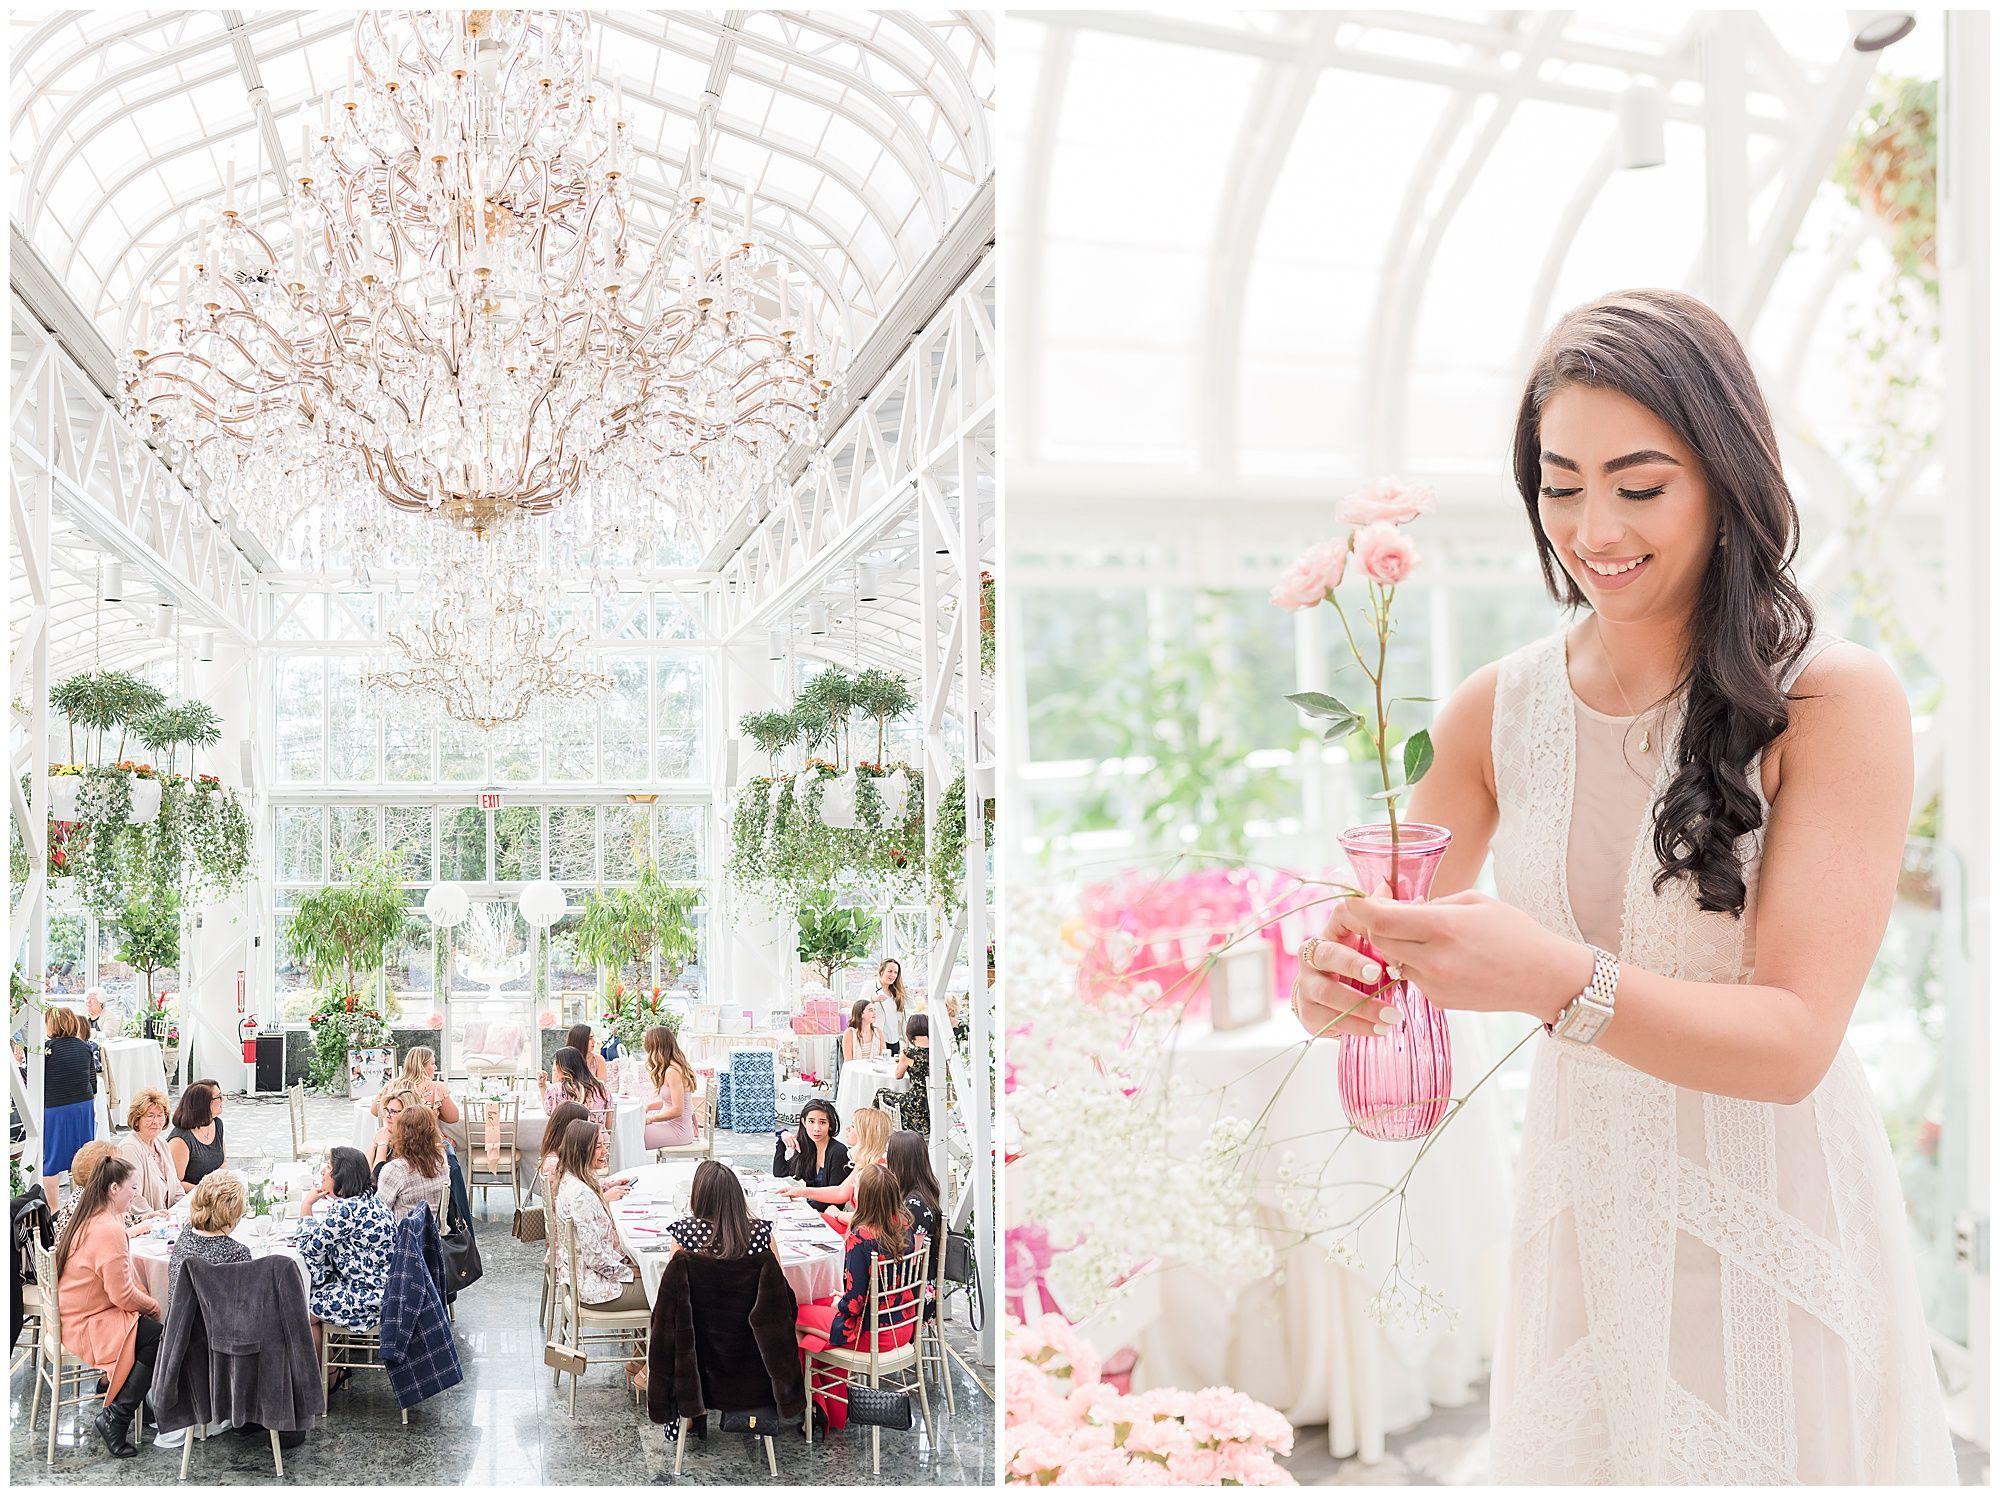 Best Bridal Shower Venue For Your Garden Shower In 2020 Bridal Shower Photography Bridal Shower Venues Bridal Shower Inspo